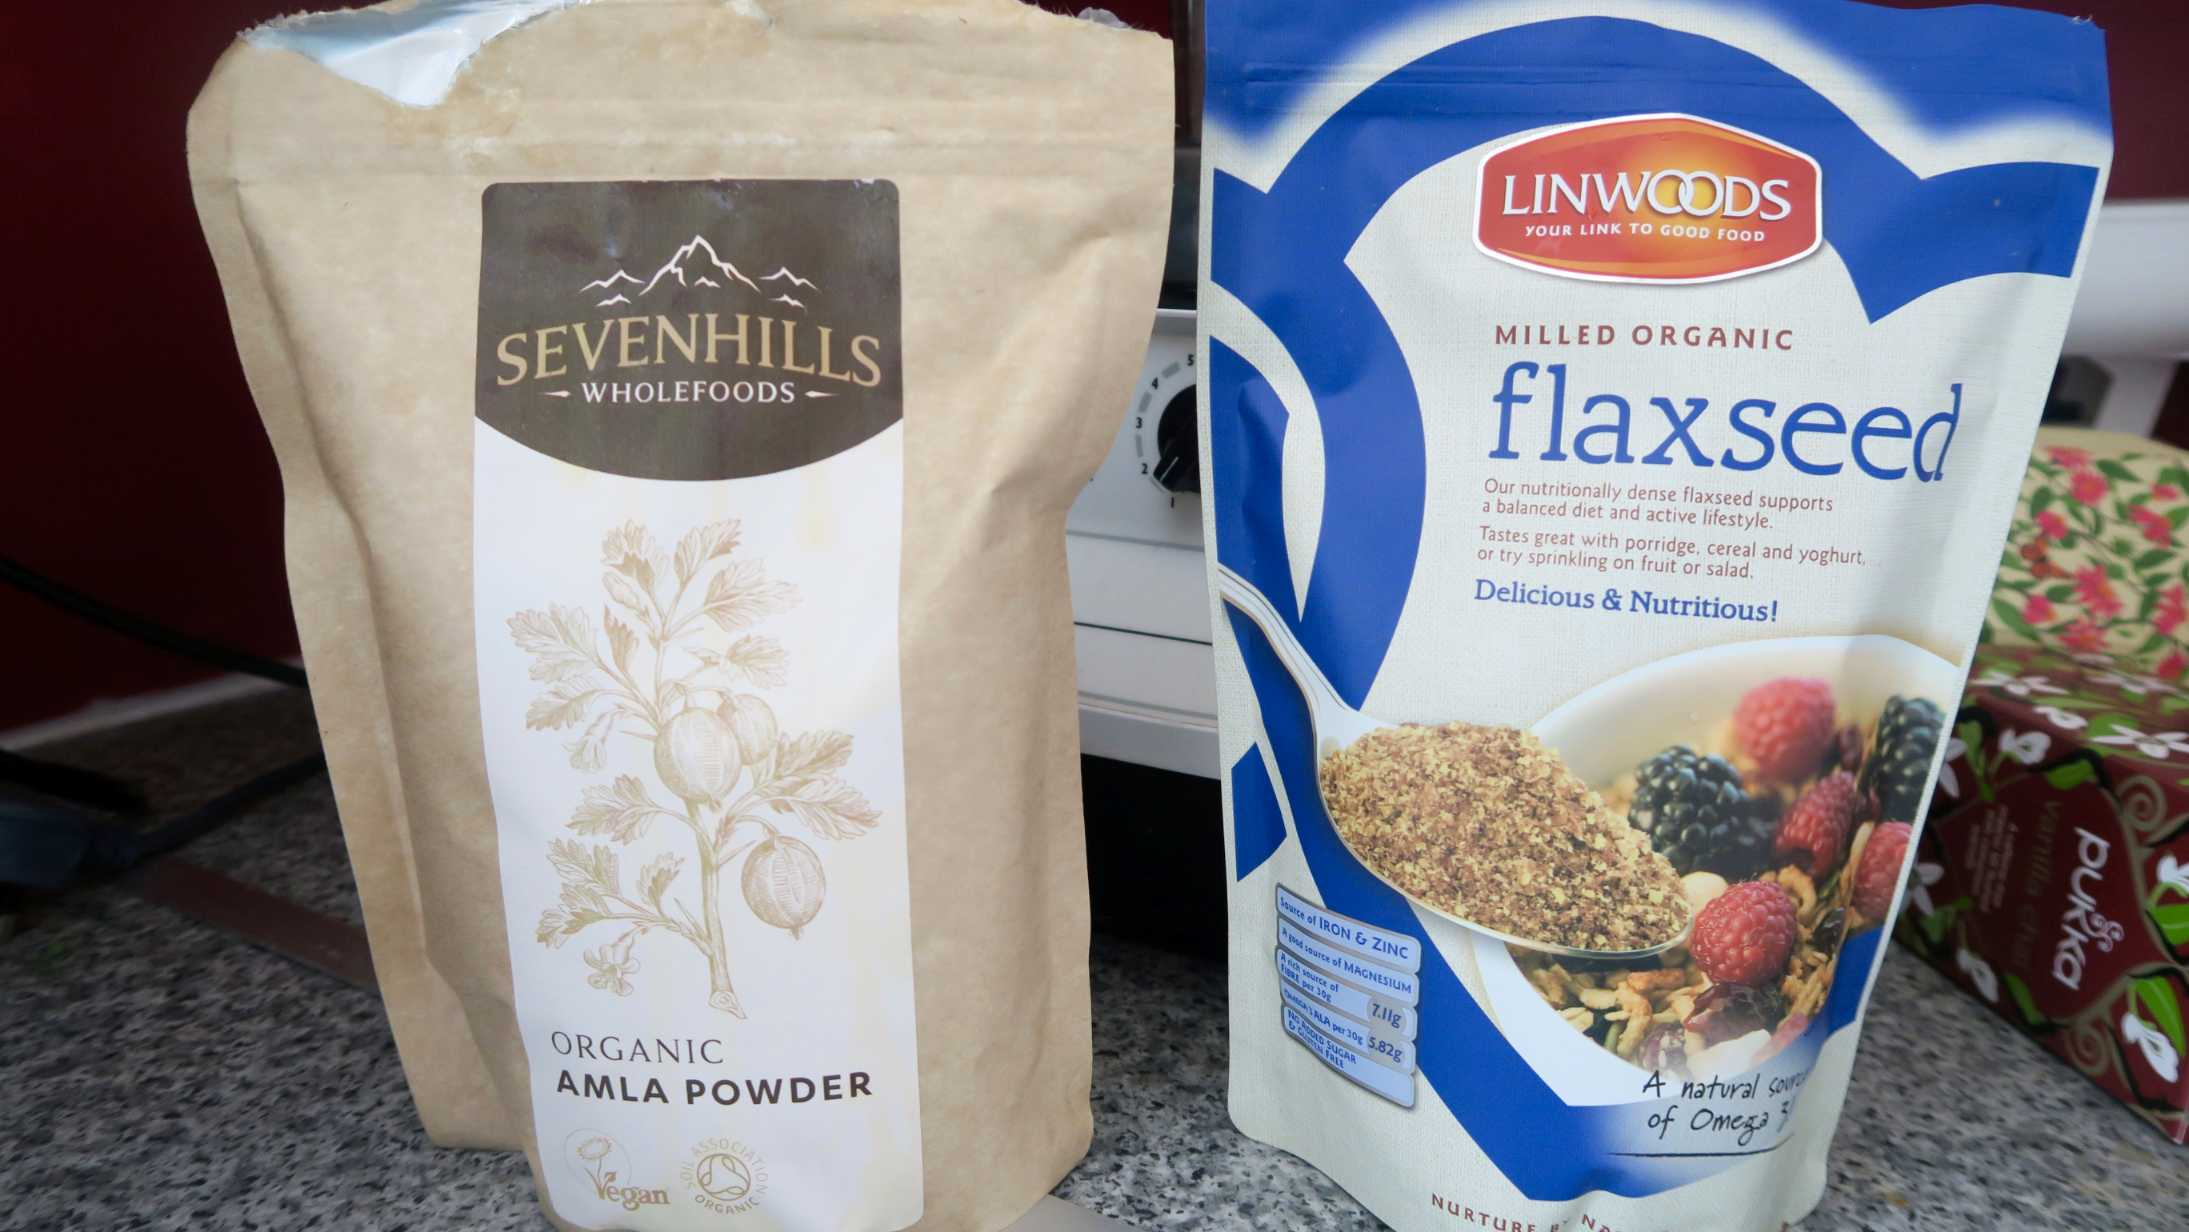 linwoods-flaxseed-sevenhills-amla